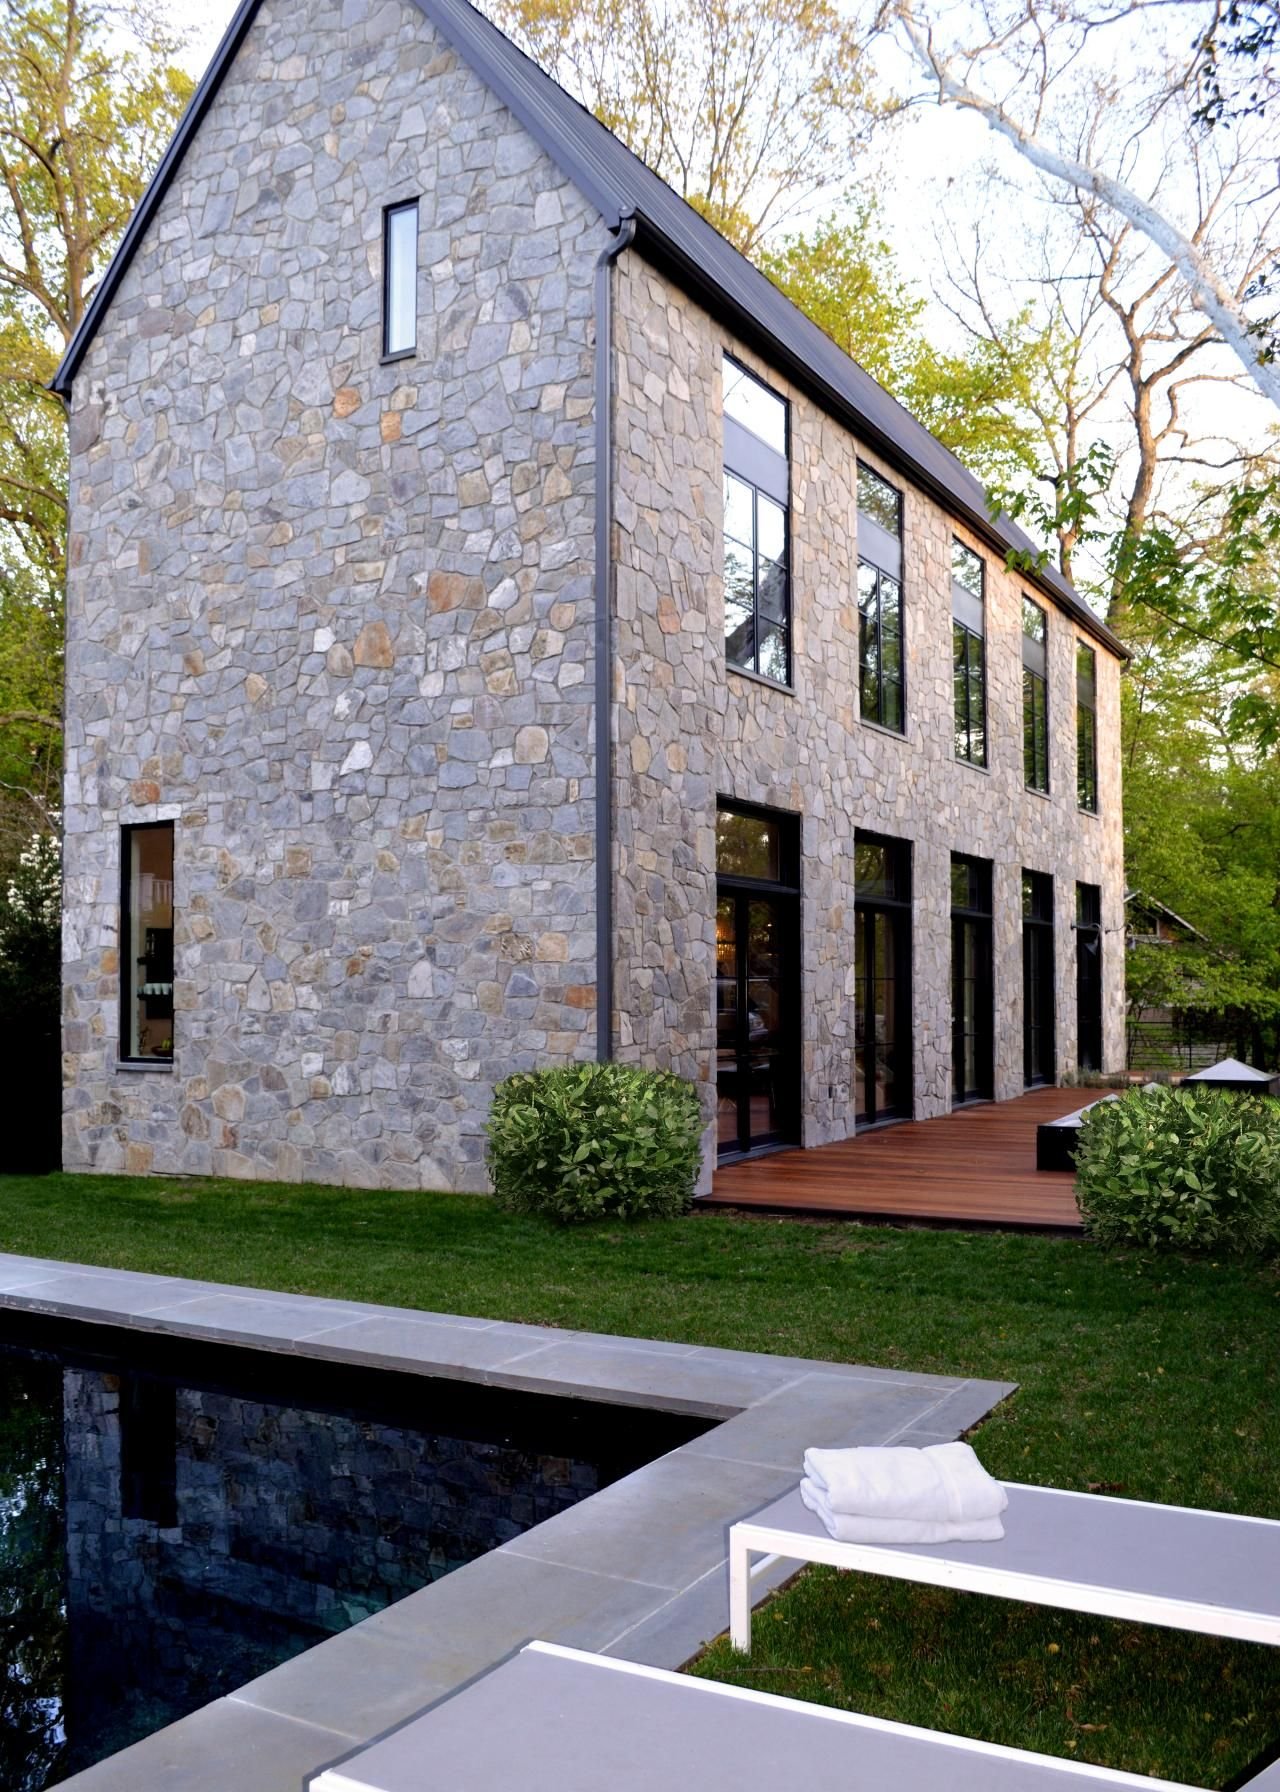 Photos Hgtv Contemporary Stone House Exterior With Gable Roof Cheap Home  Siding Design Tool